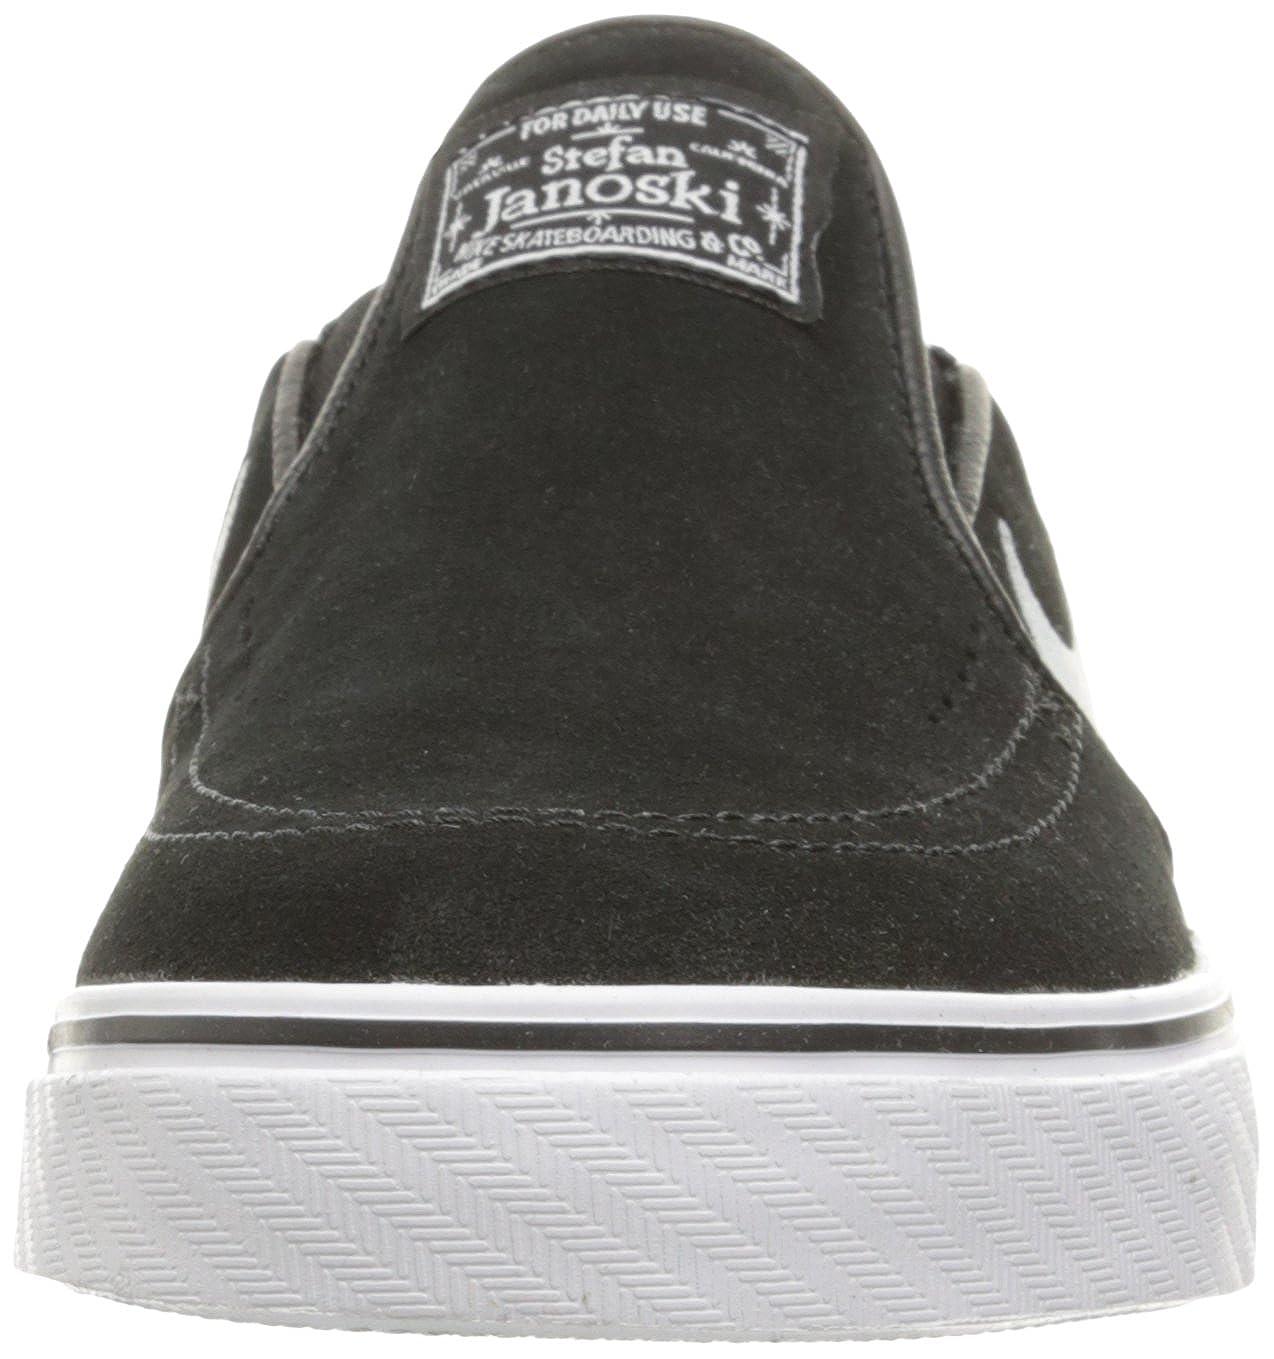 779e8917 Amazon.com | Nike Men's Zoom Stefan Janoski Slip Black/White Skate Shoe 9  Men US | Fashion Sneakers